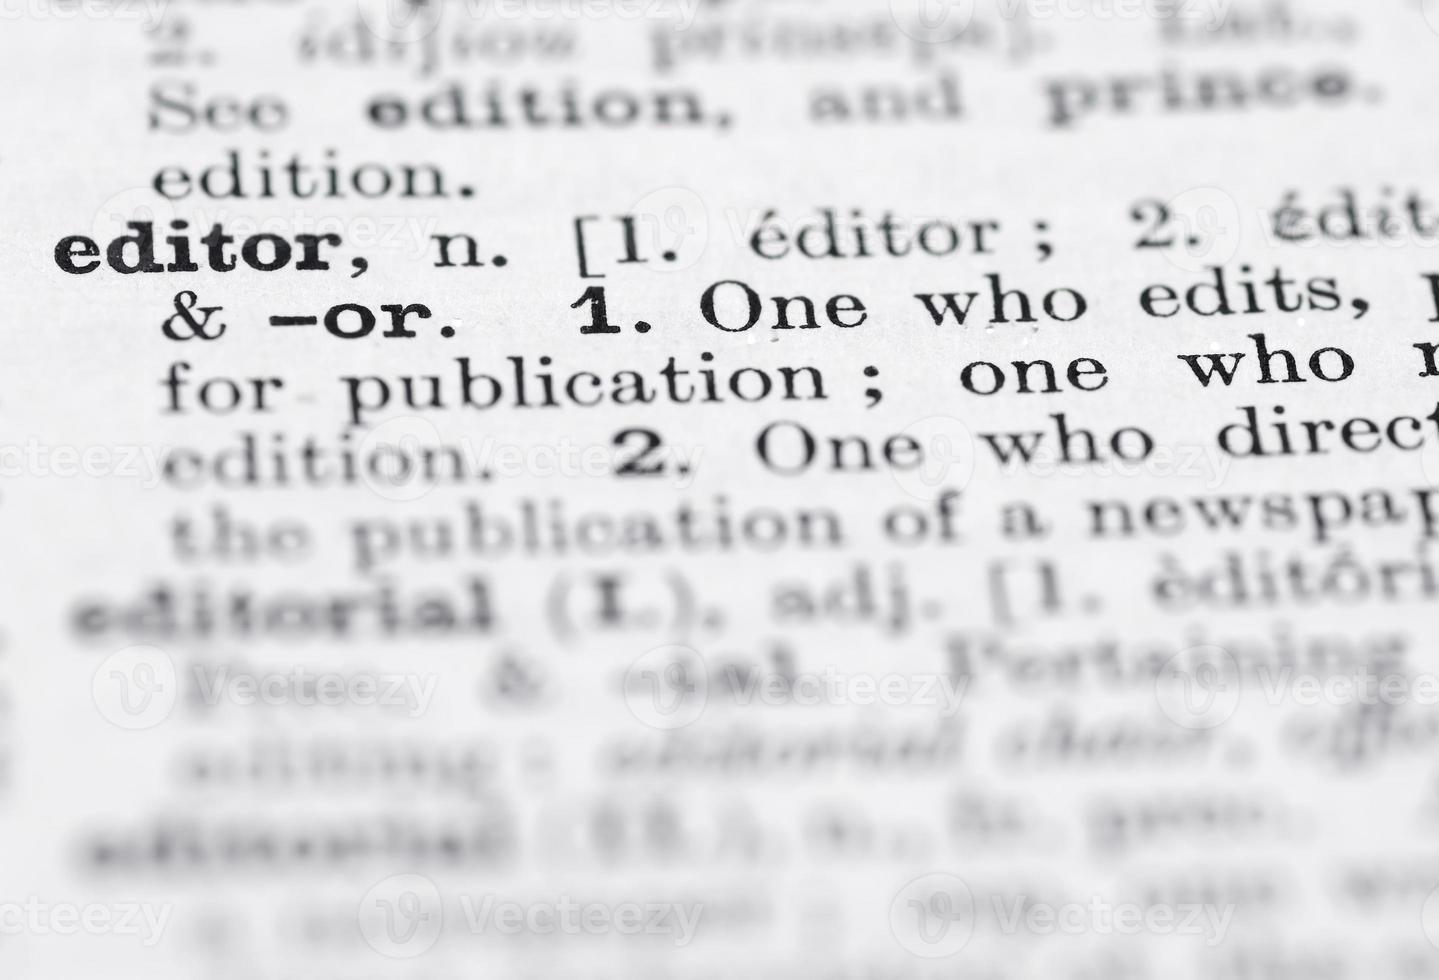 editor definitie in engels woordenboek. foto